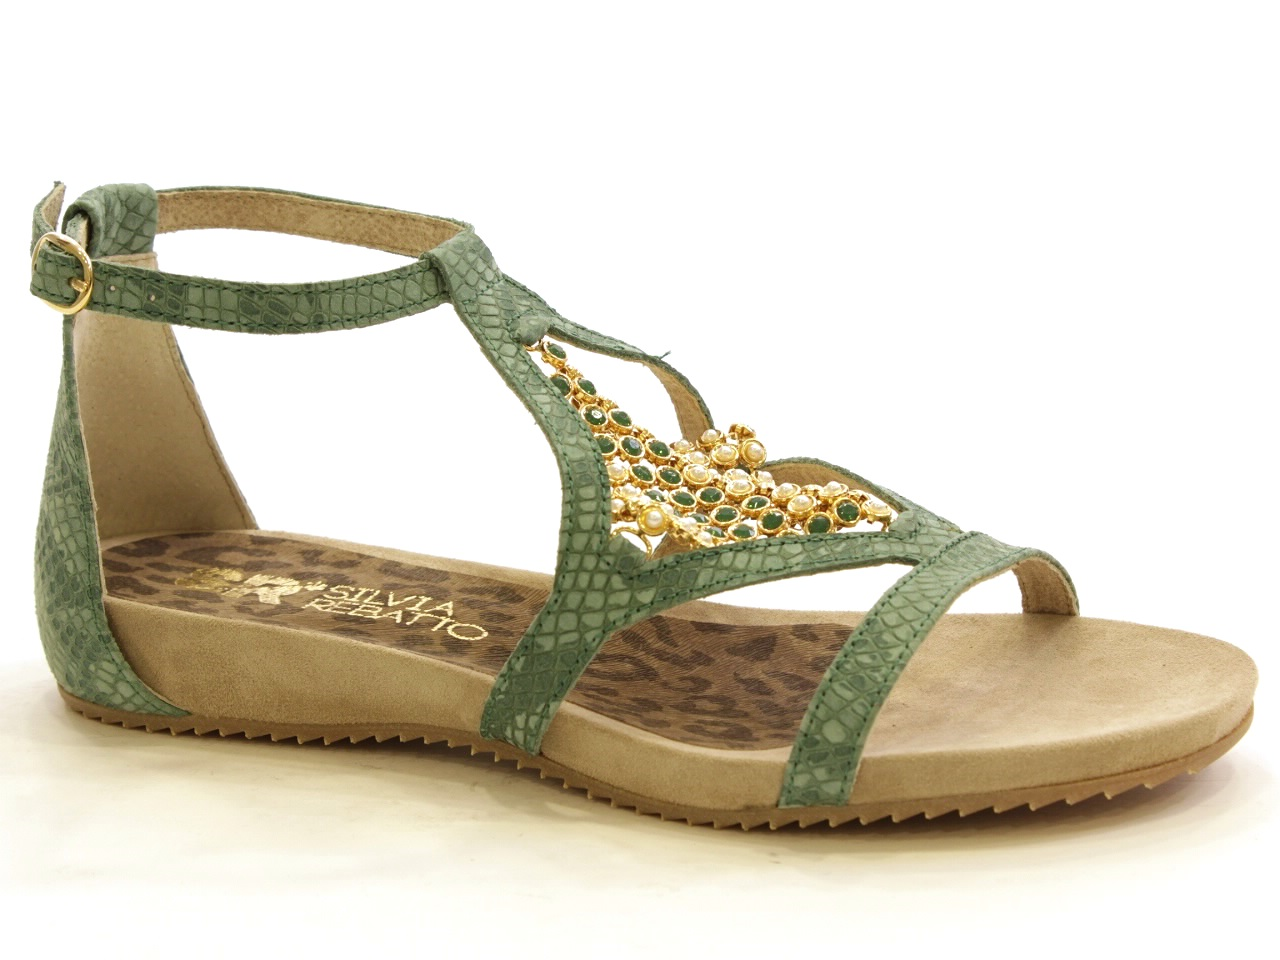 Flat Sandals Silvia Rebatto - 019 S9036